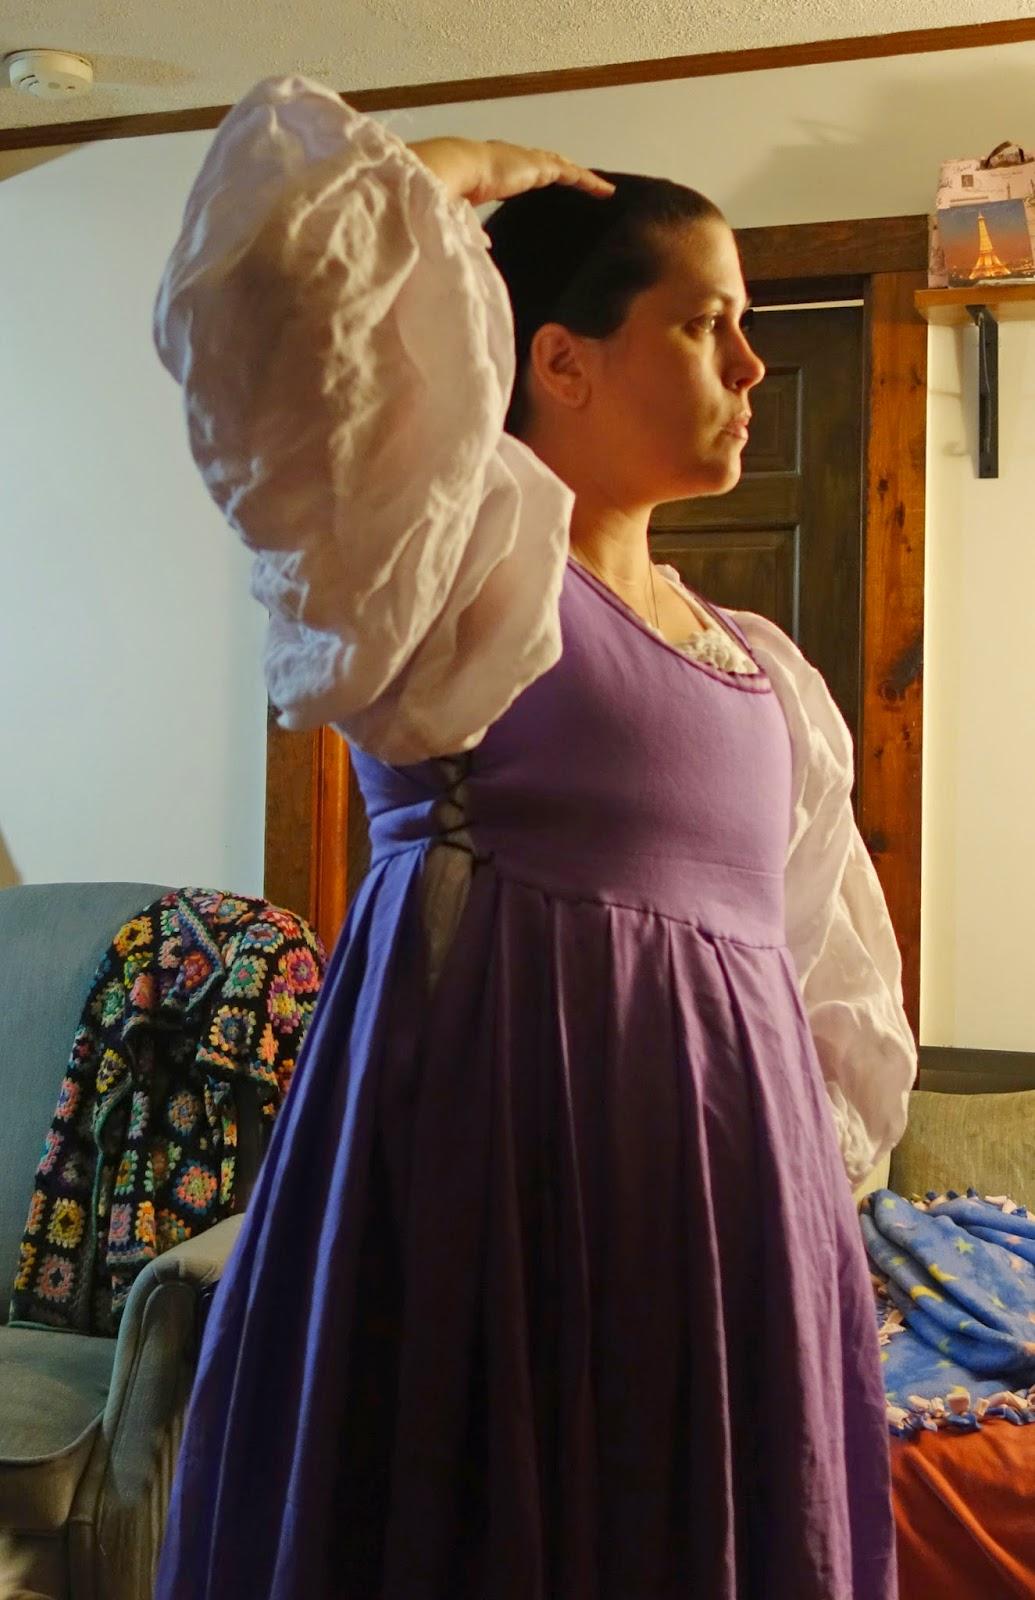 Lilac 1500u0027s Venetian Dress & Isabellau0027s Project Diary: Lilac 1500u0027s Venetian Dress